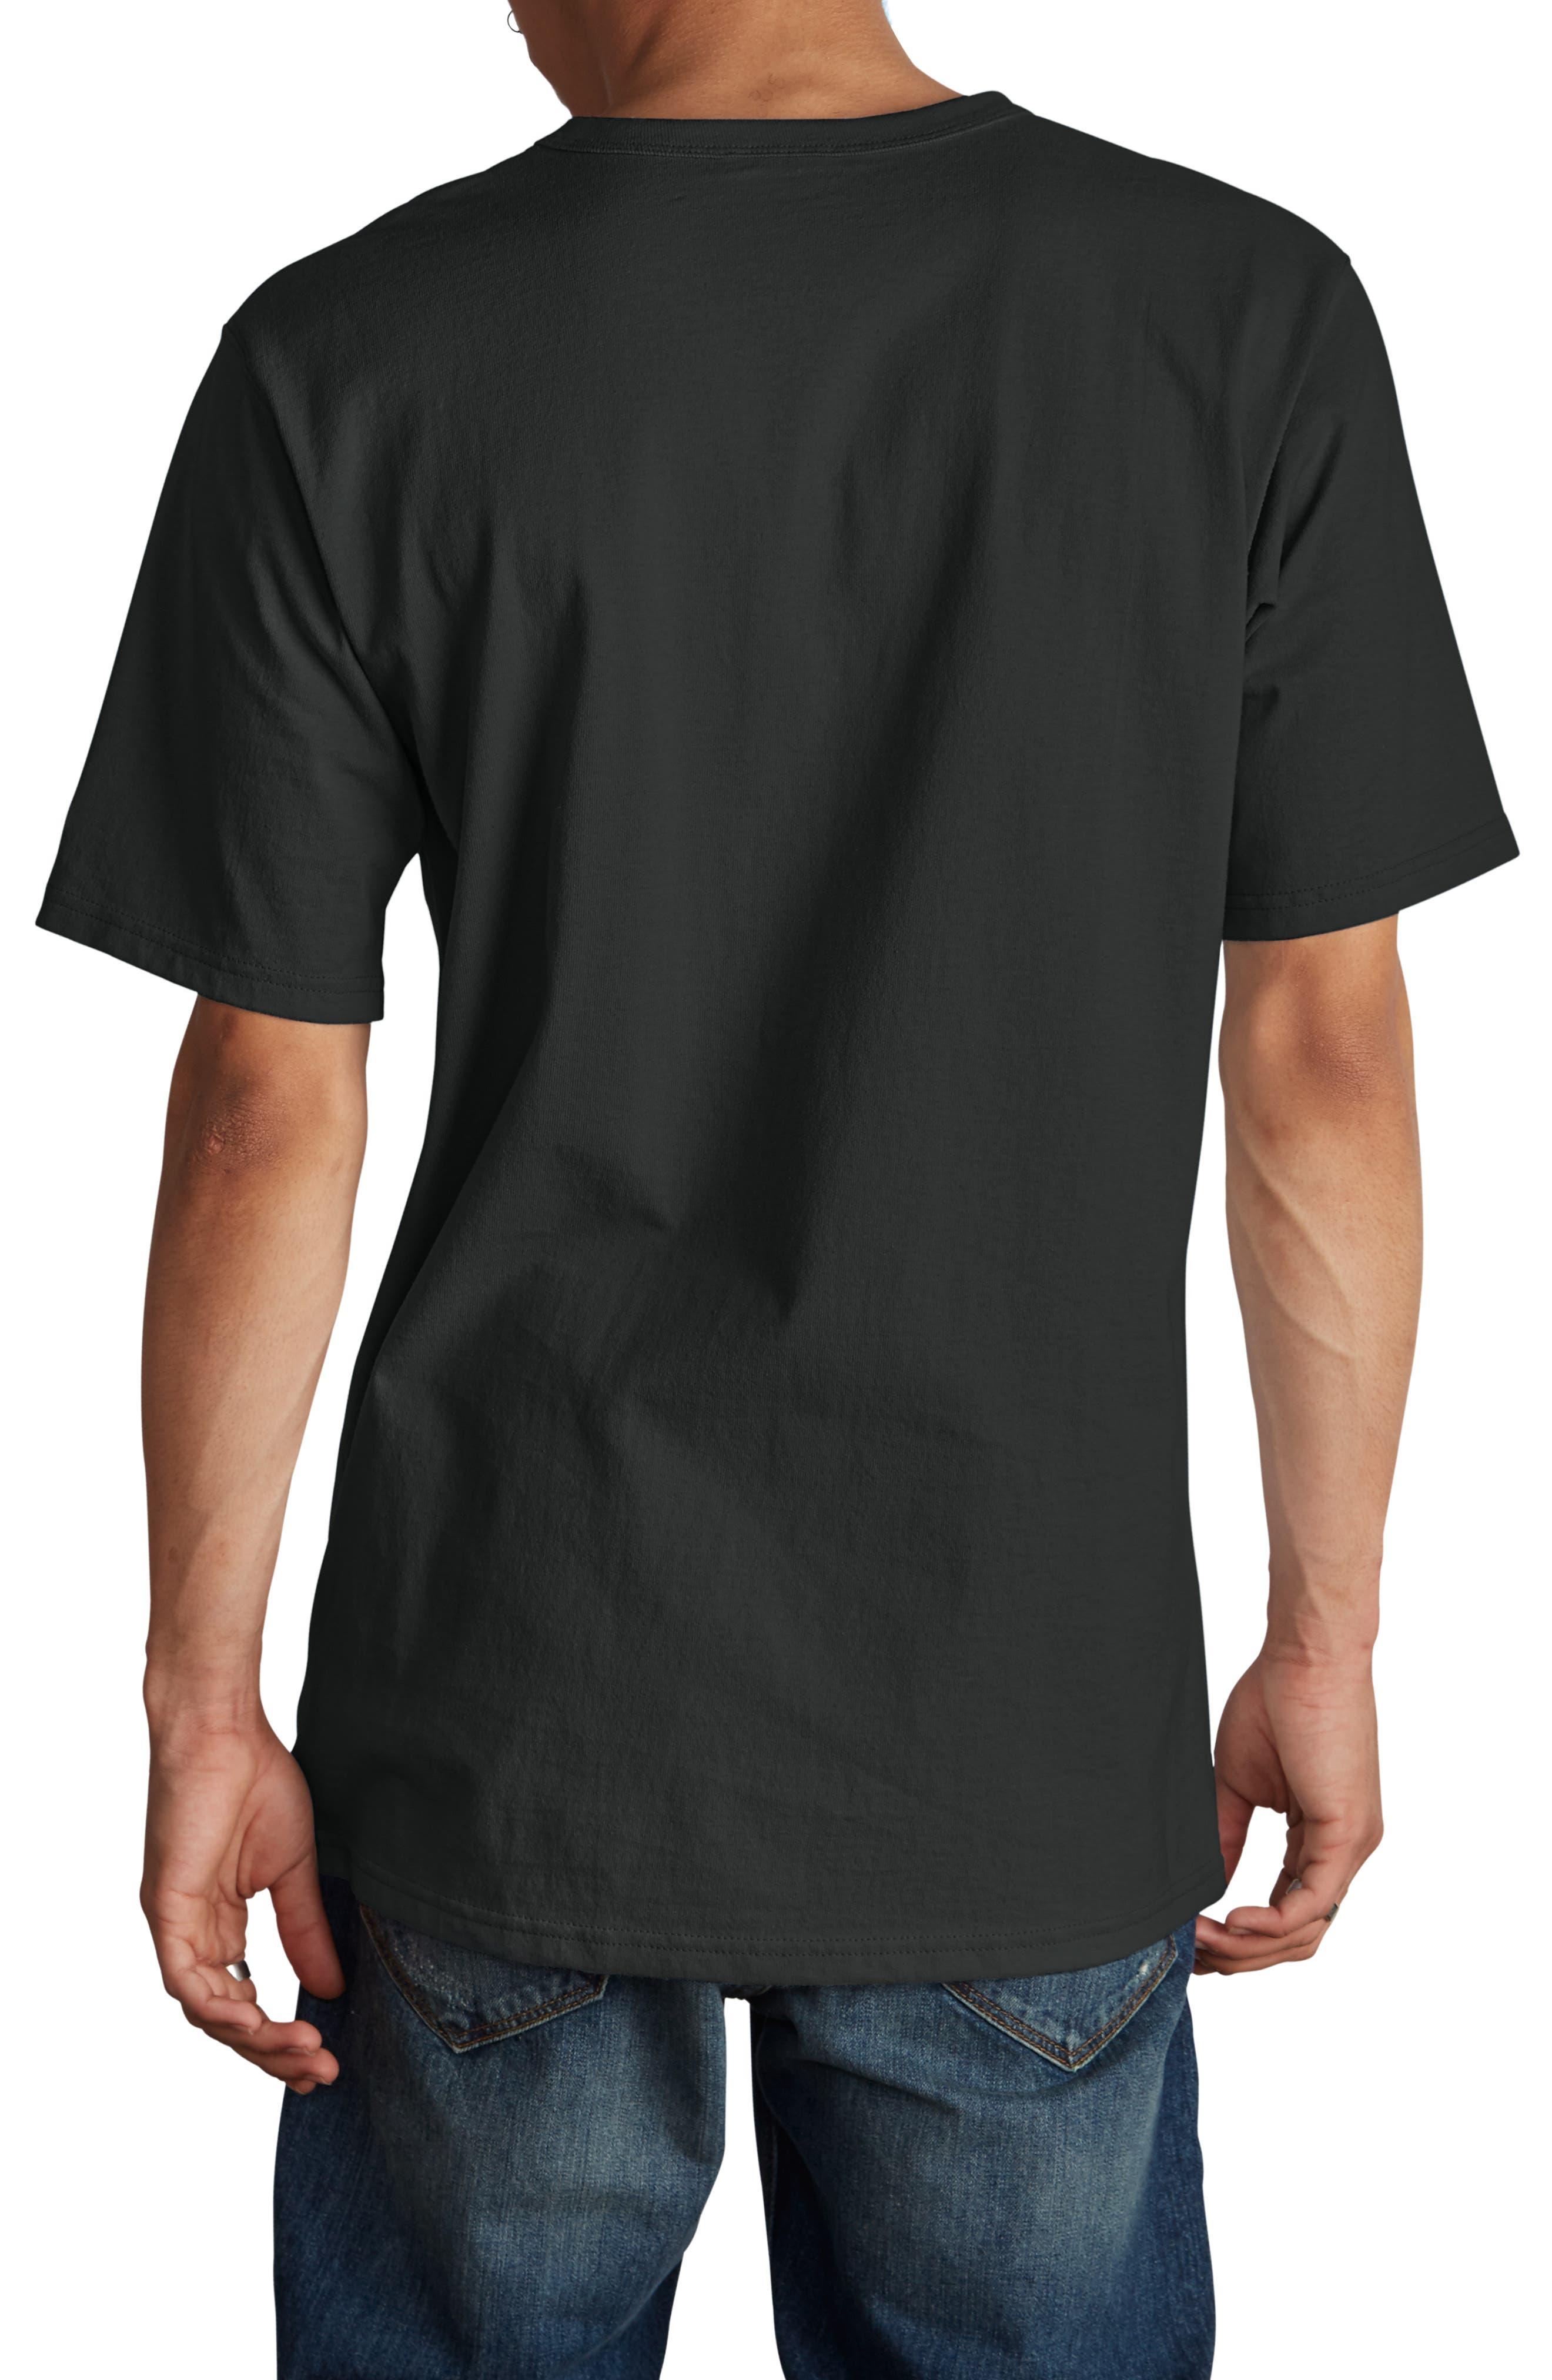 CHAMPION, Elevated C-Patch T-Shirt, Alternate thumbnail 2, color, BLACK